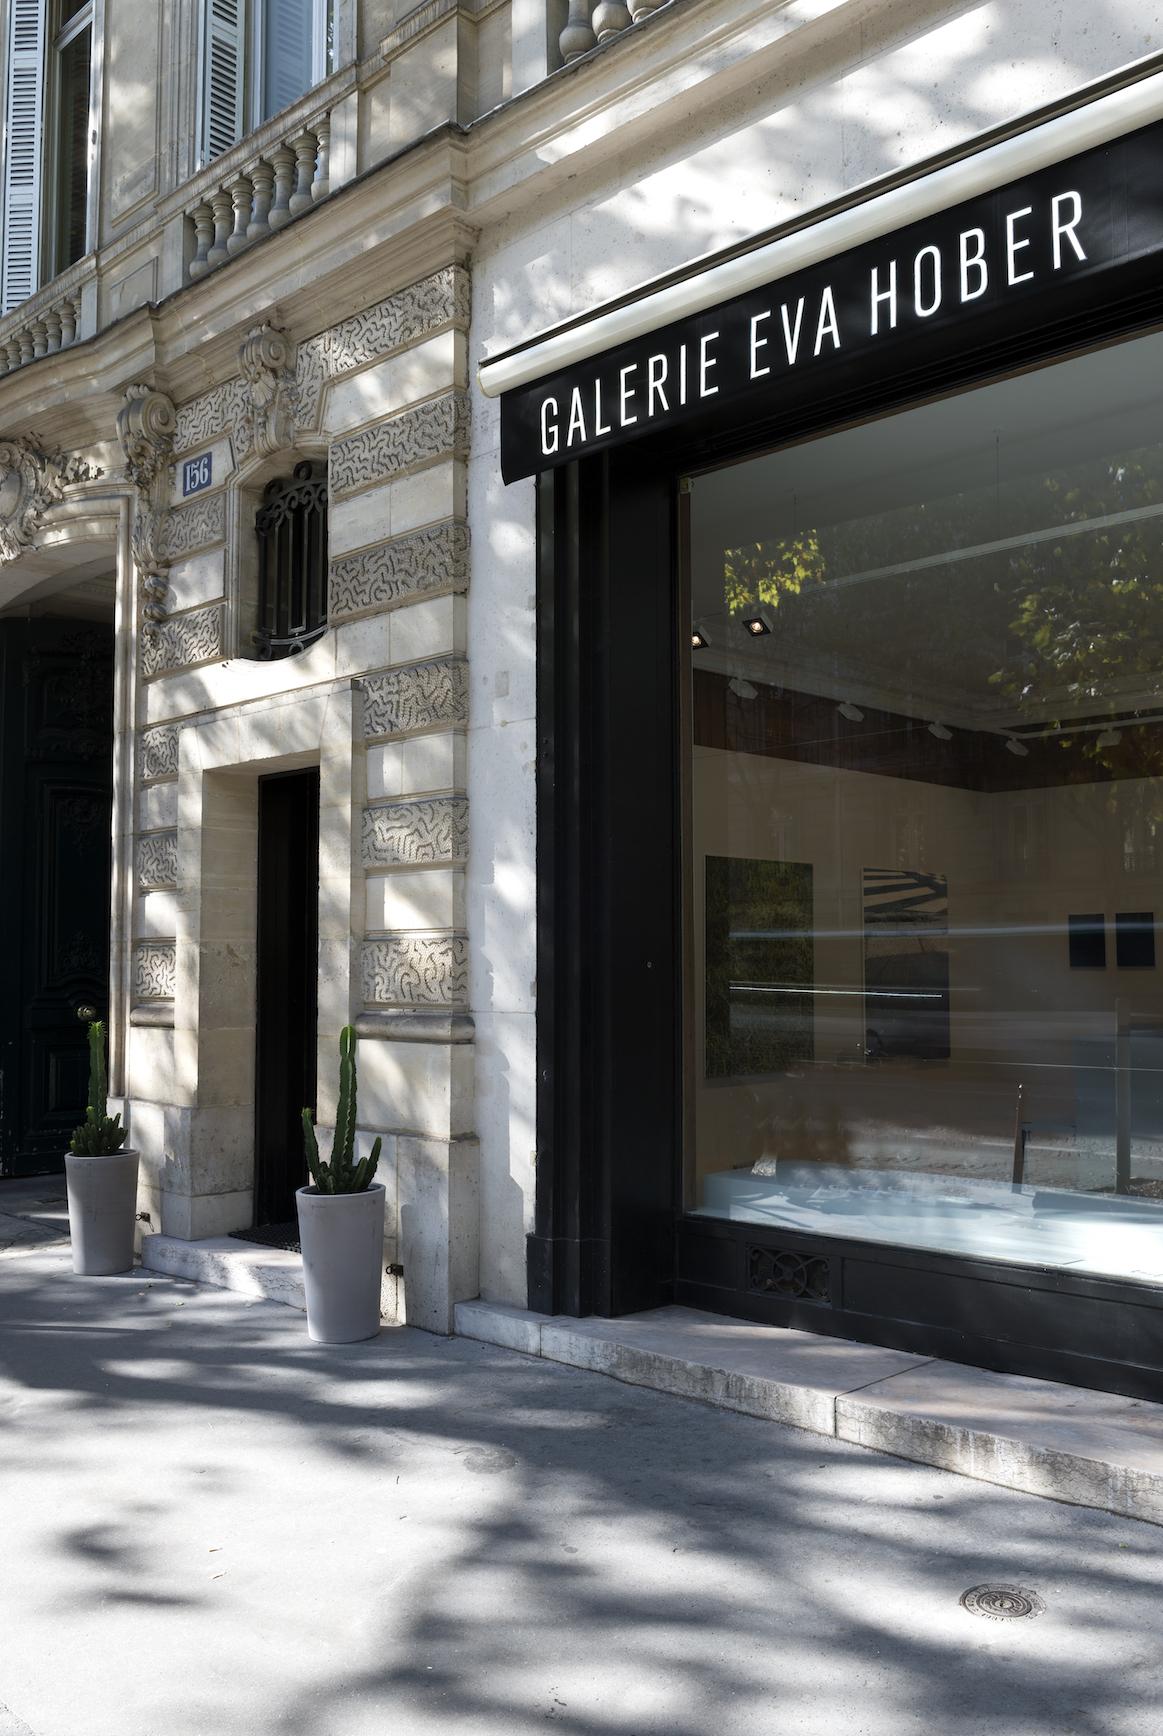 Galerie Eva Hober